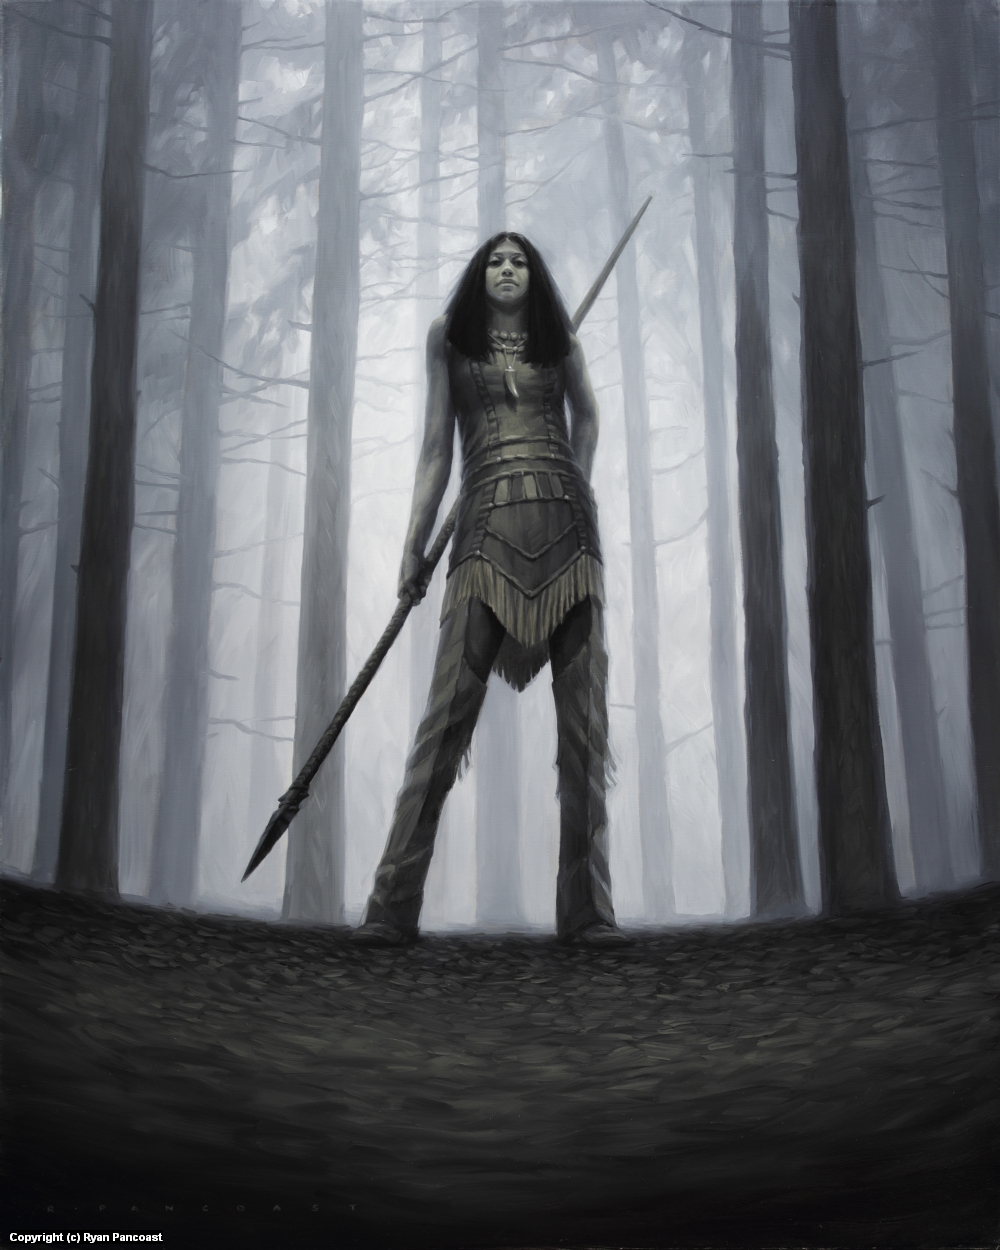 Huntress Artwork by Ryan Pancoast